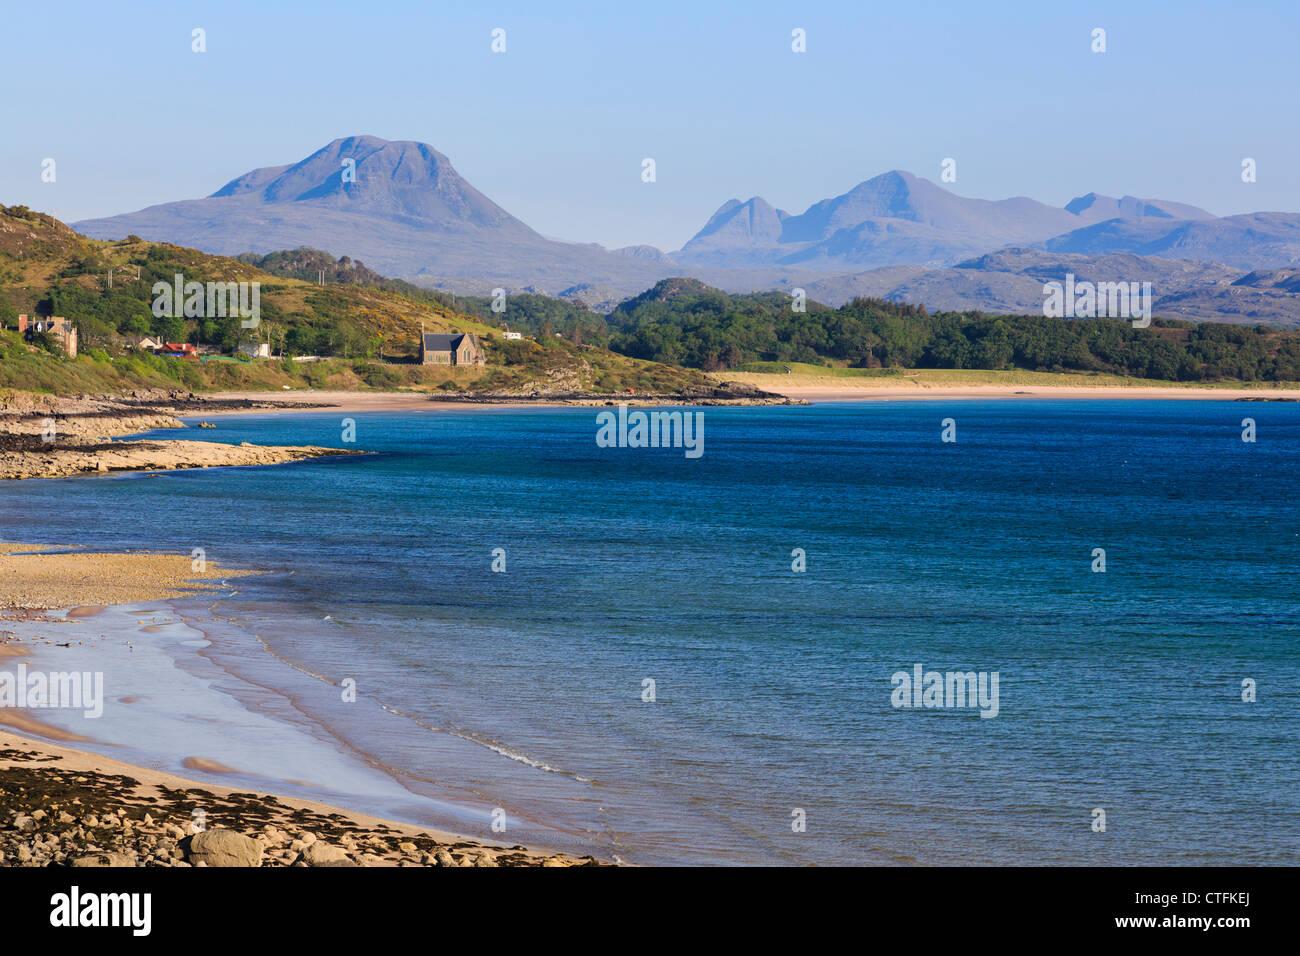 stunning view across Strath Bay in Loch Gairloch on northwest Scottish Highlands coast to Torridon mountains. Wester - Stock Image